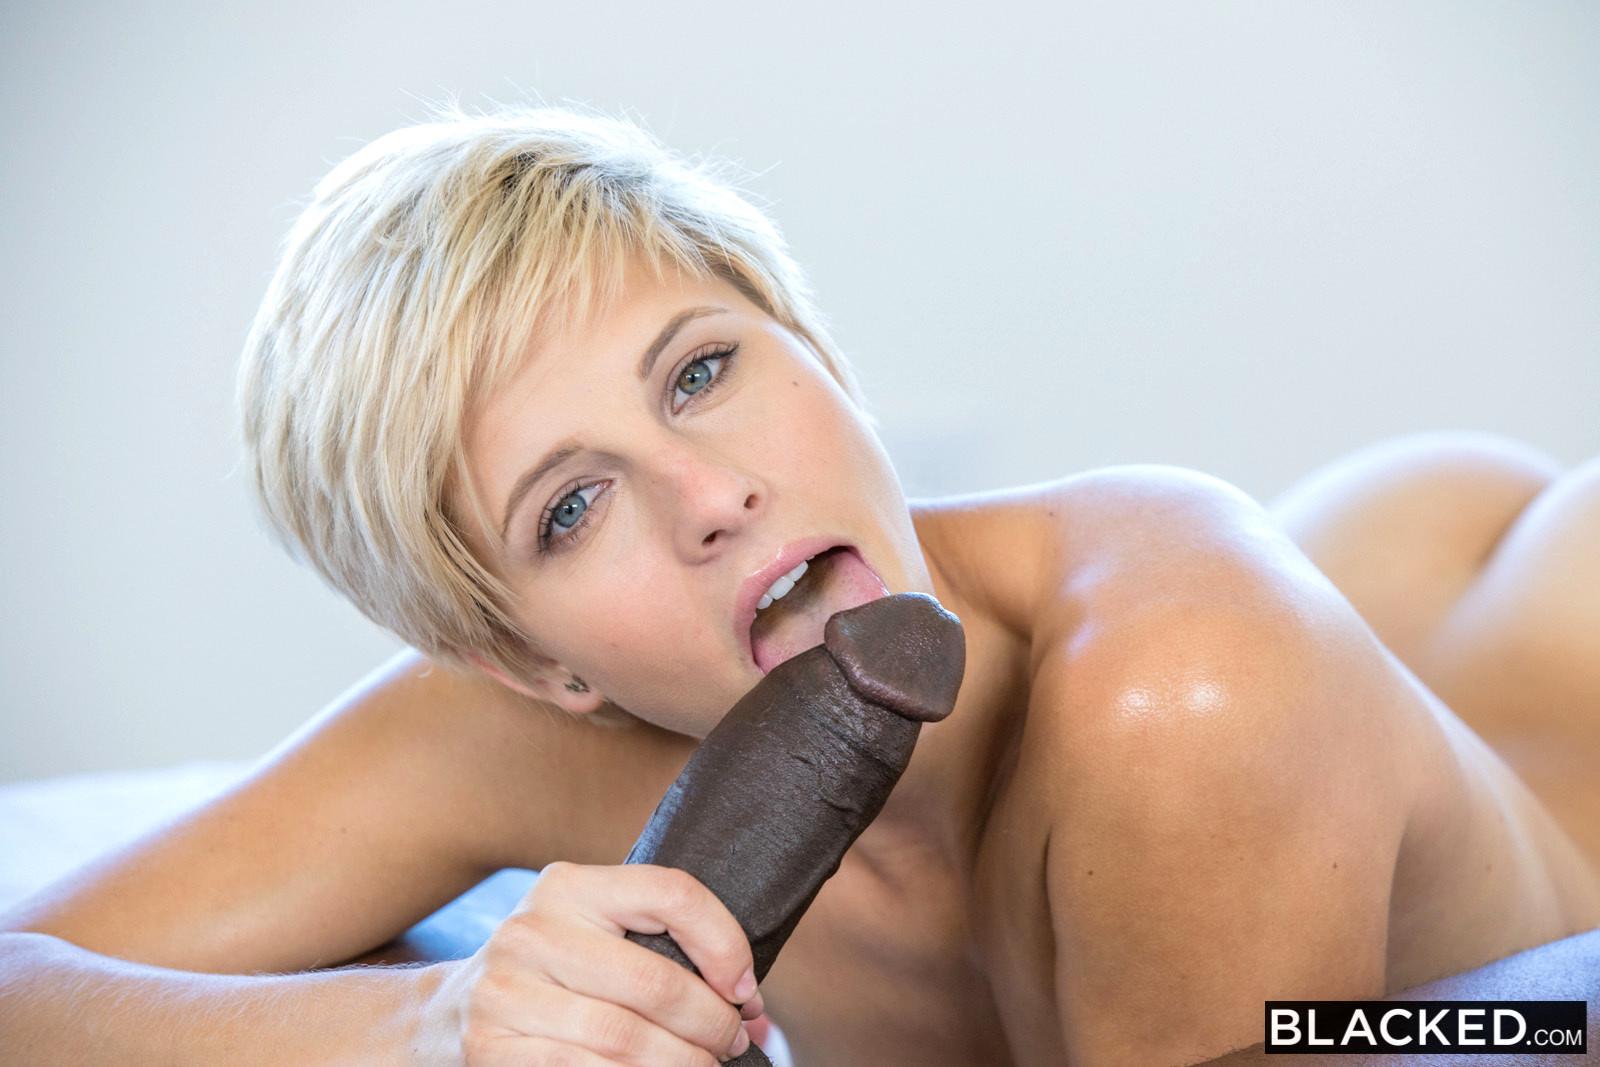 korotkostrizhennie-sportsmenki-porno-domashnee-porno